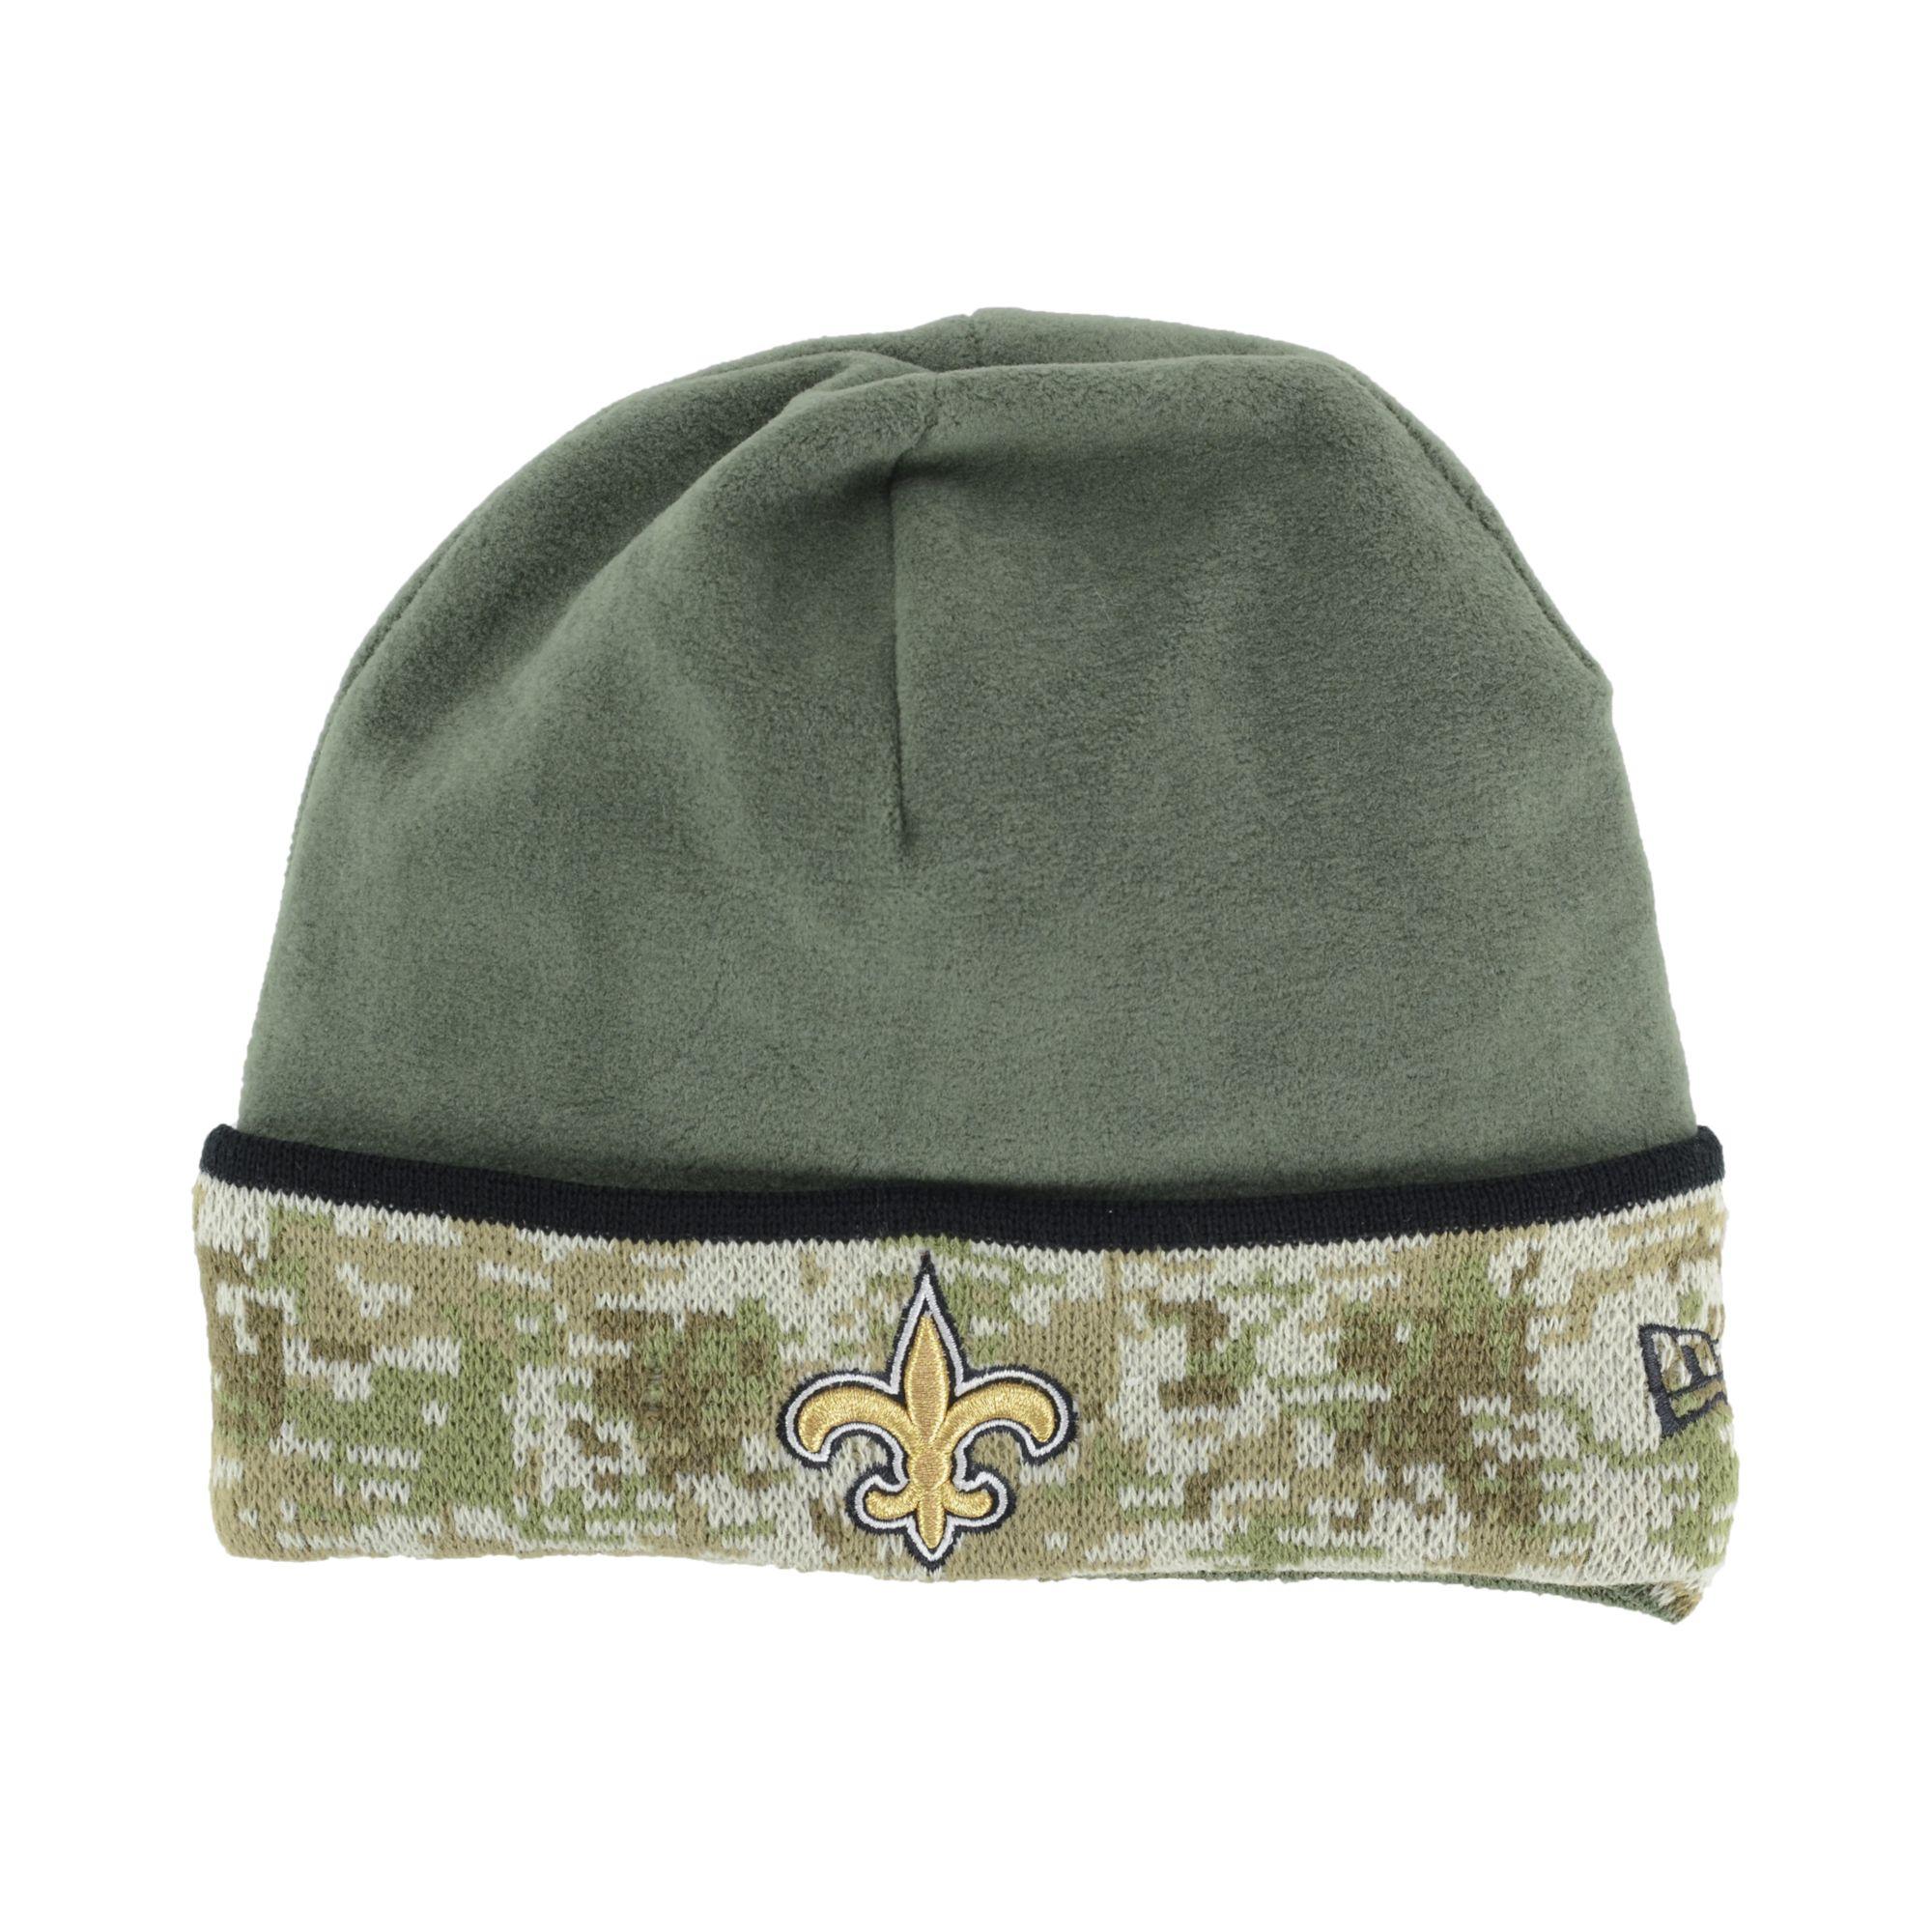 e019b0d2c KTZ New Orleans Saints Salute To Service Knit Hat in Green for Men ...